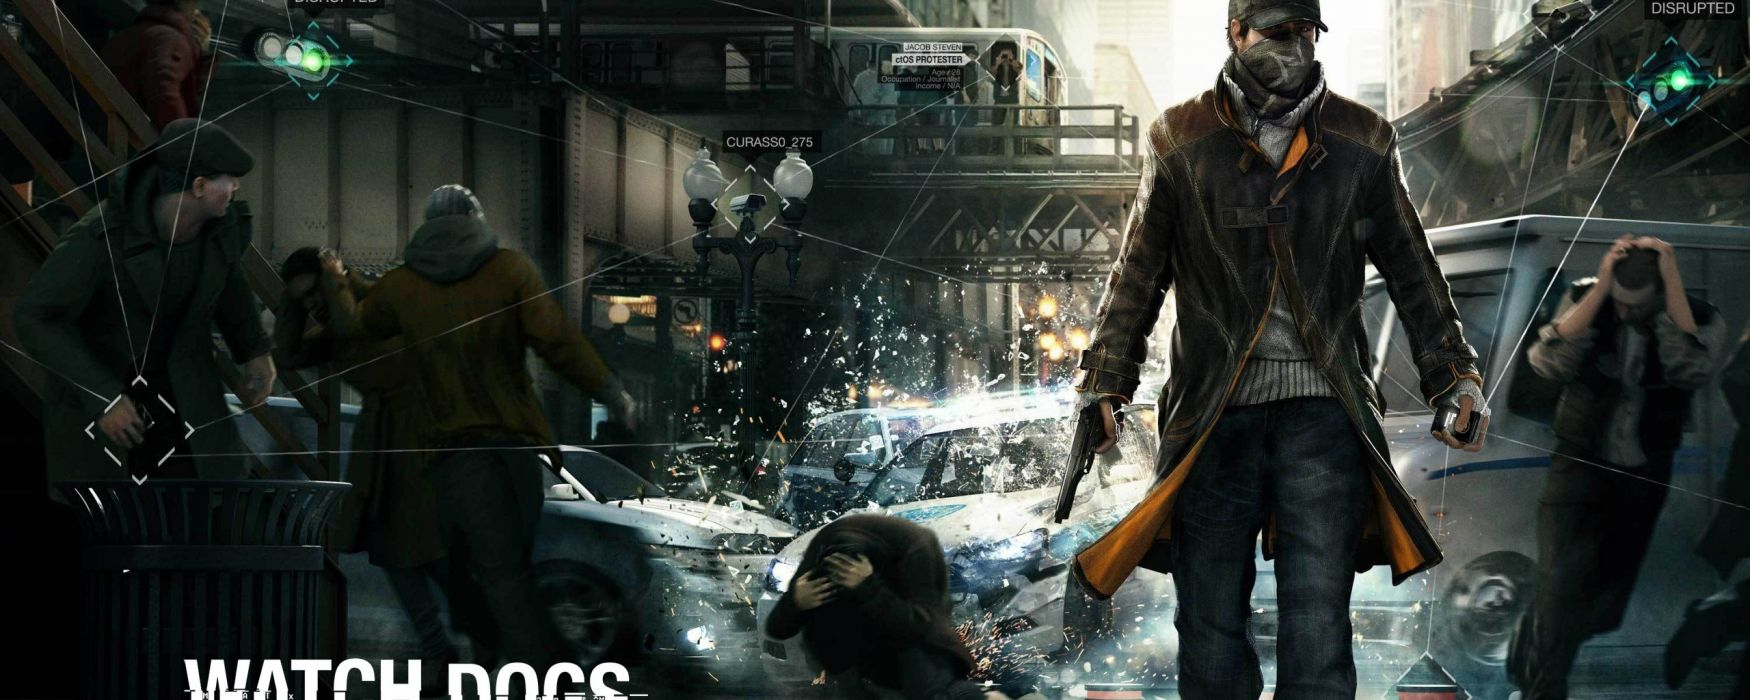 WATCH DOGS futuristic cyberpunk warrior action fighting 1wdogs adventure shooter sci-fi watchdogs poster wallpaper